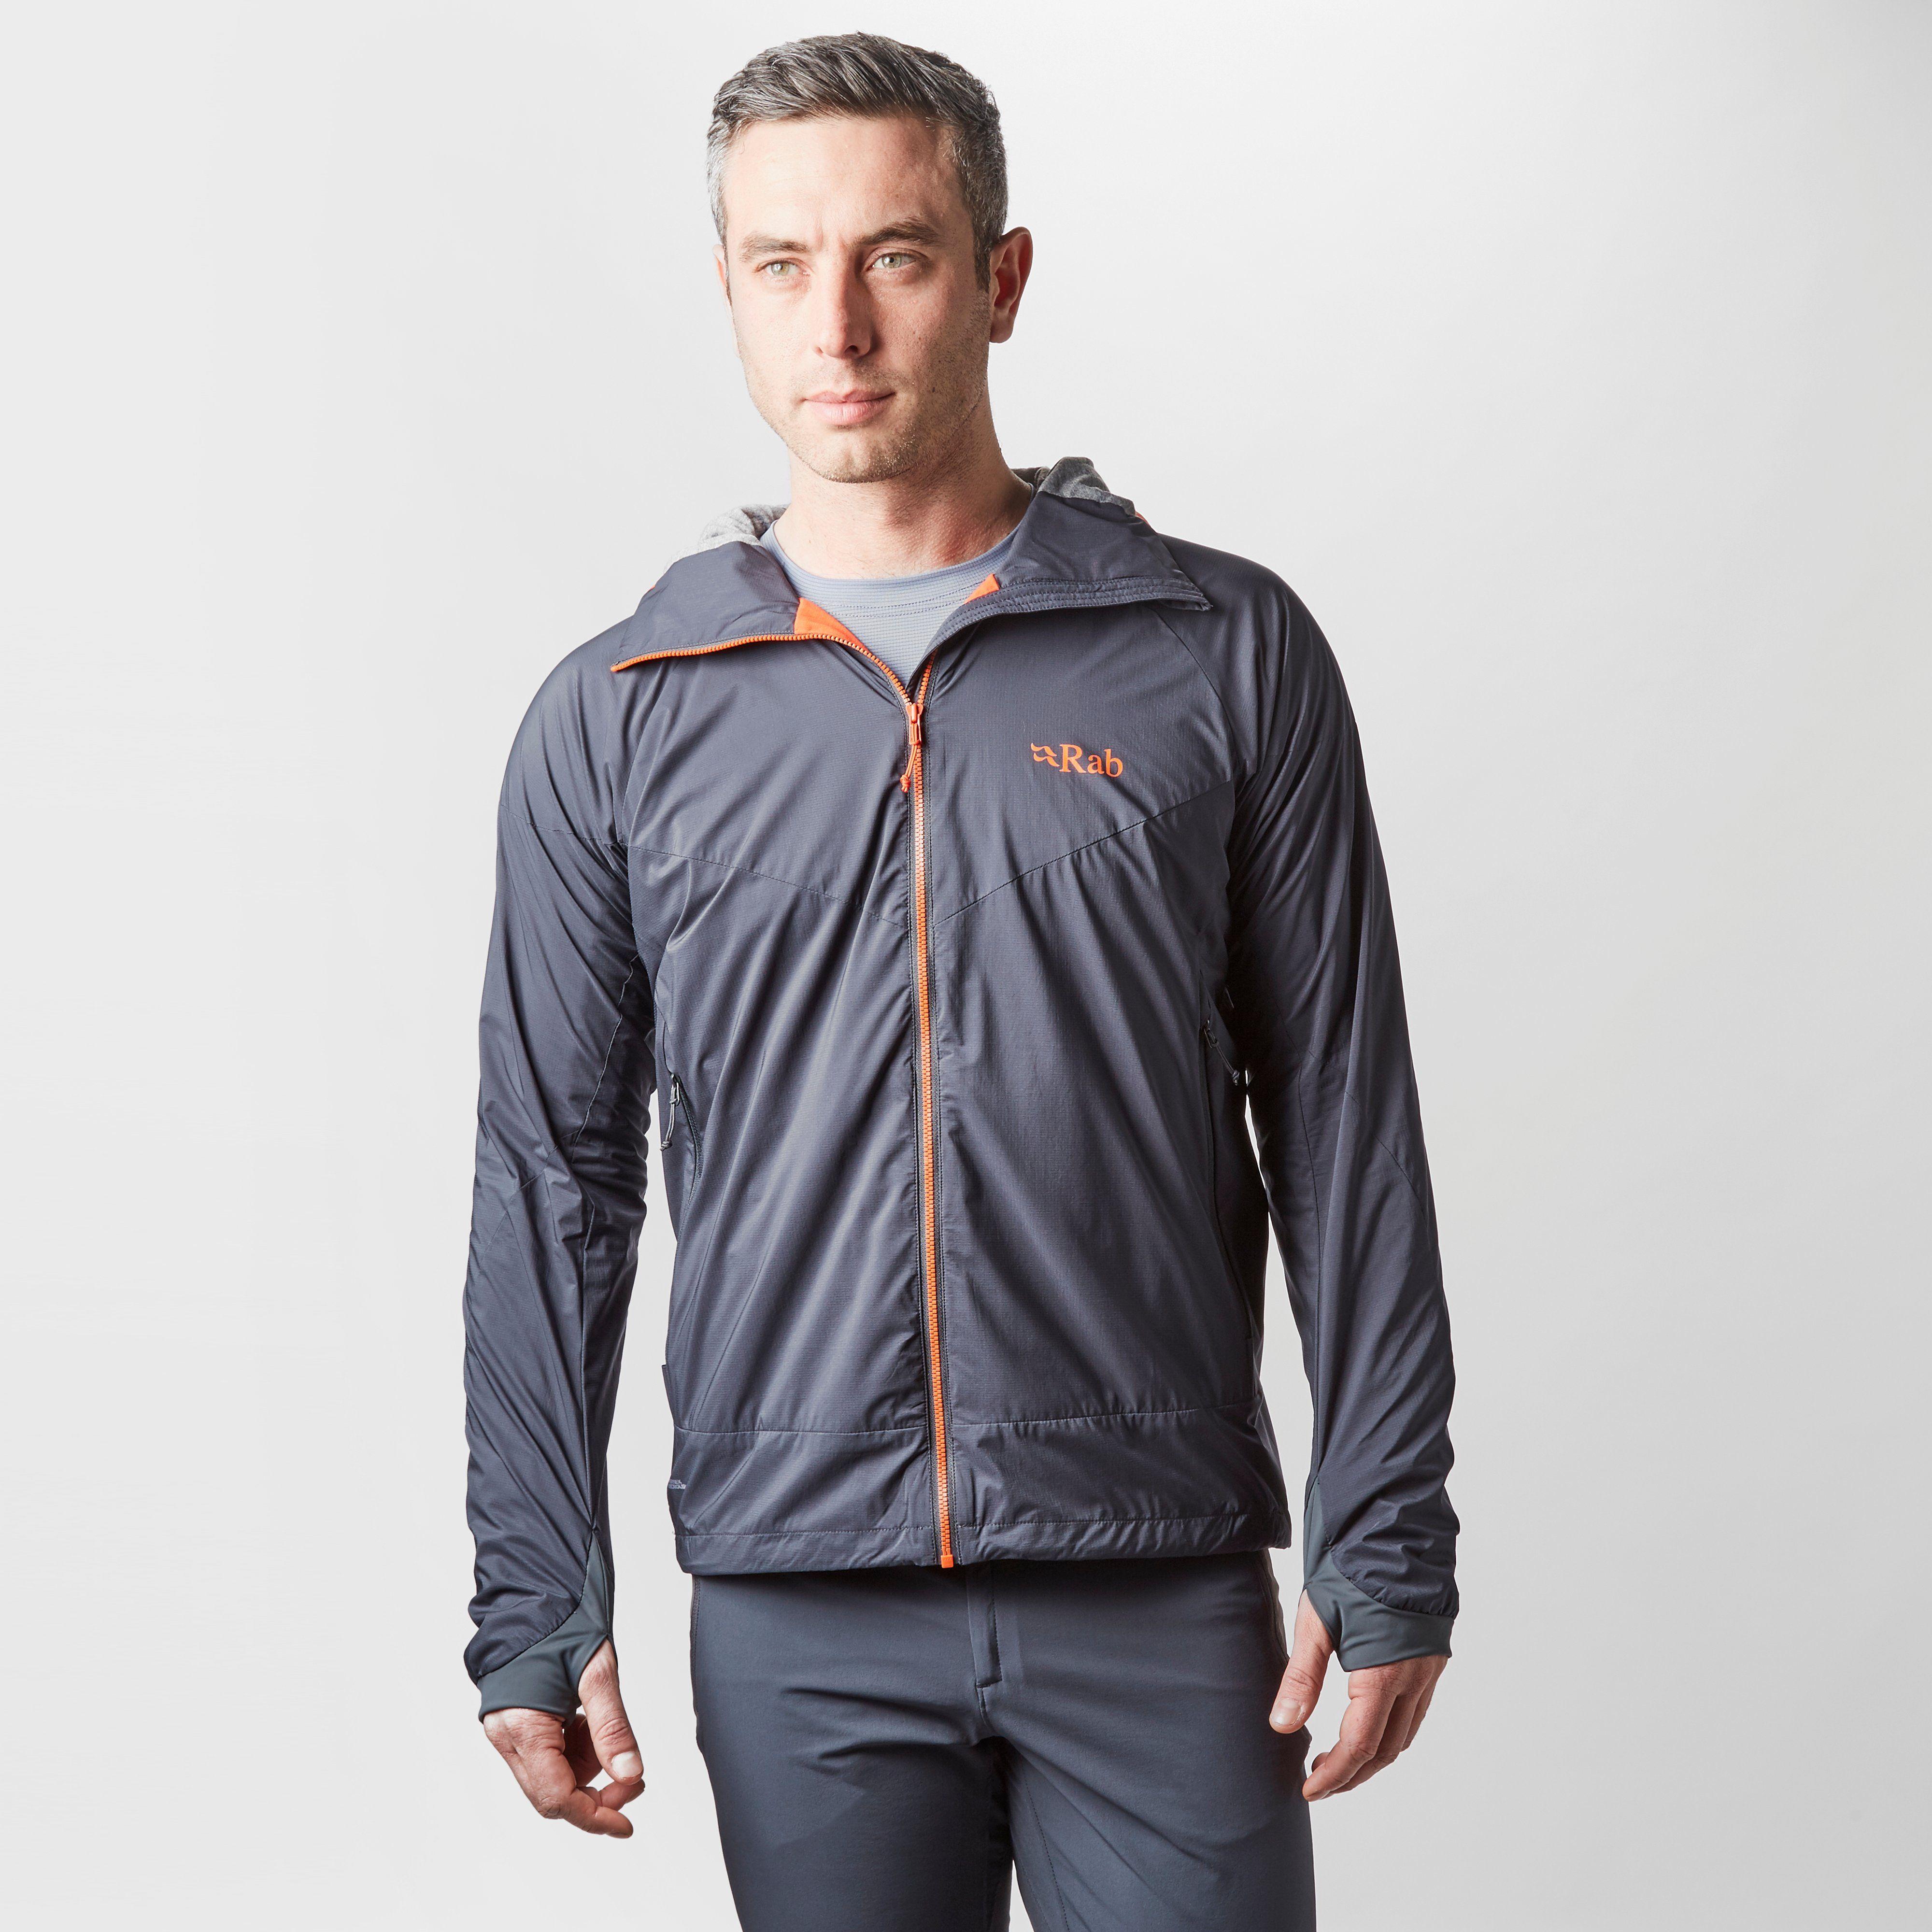 RAB Men's Rampage Softshell Jacket